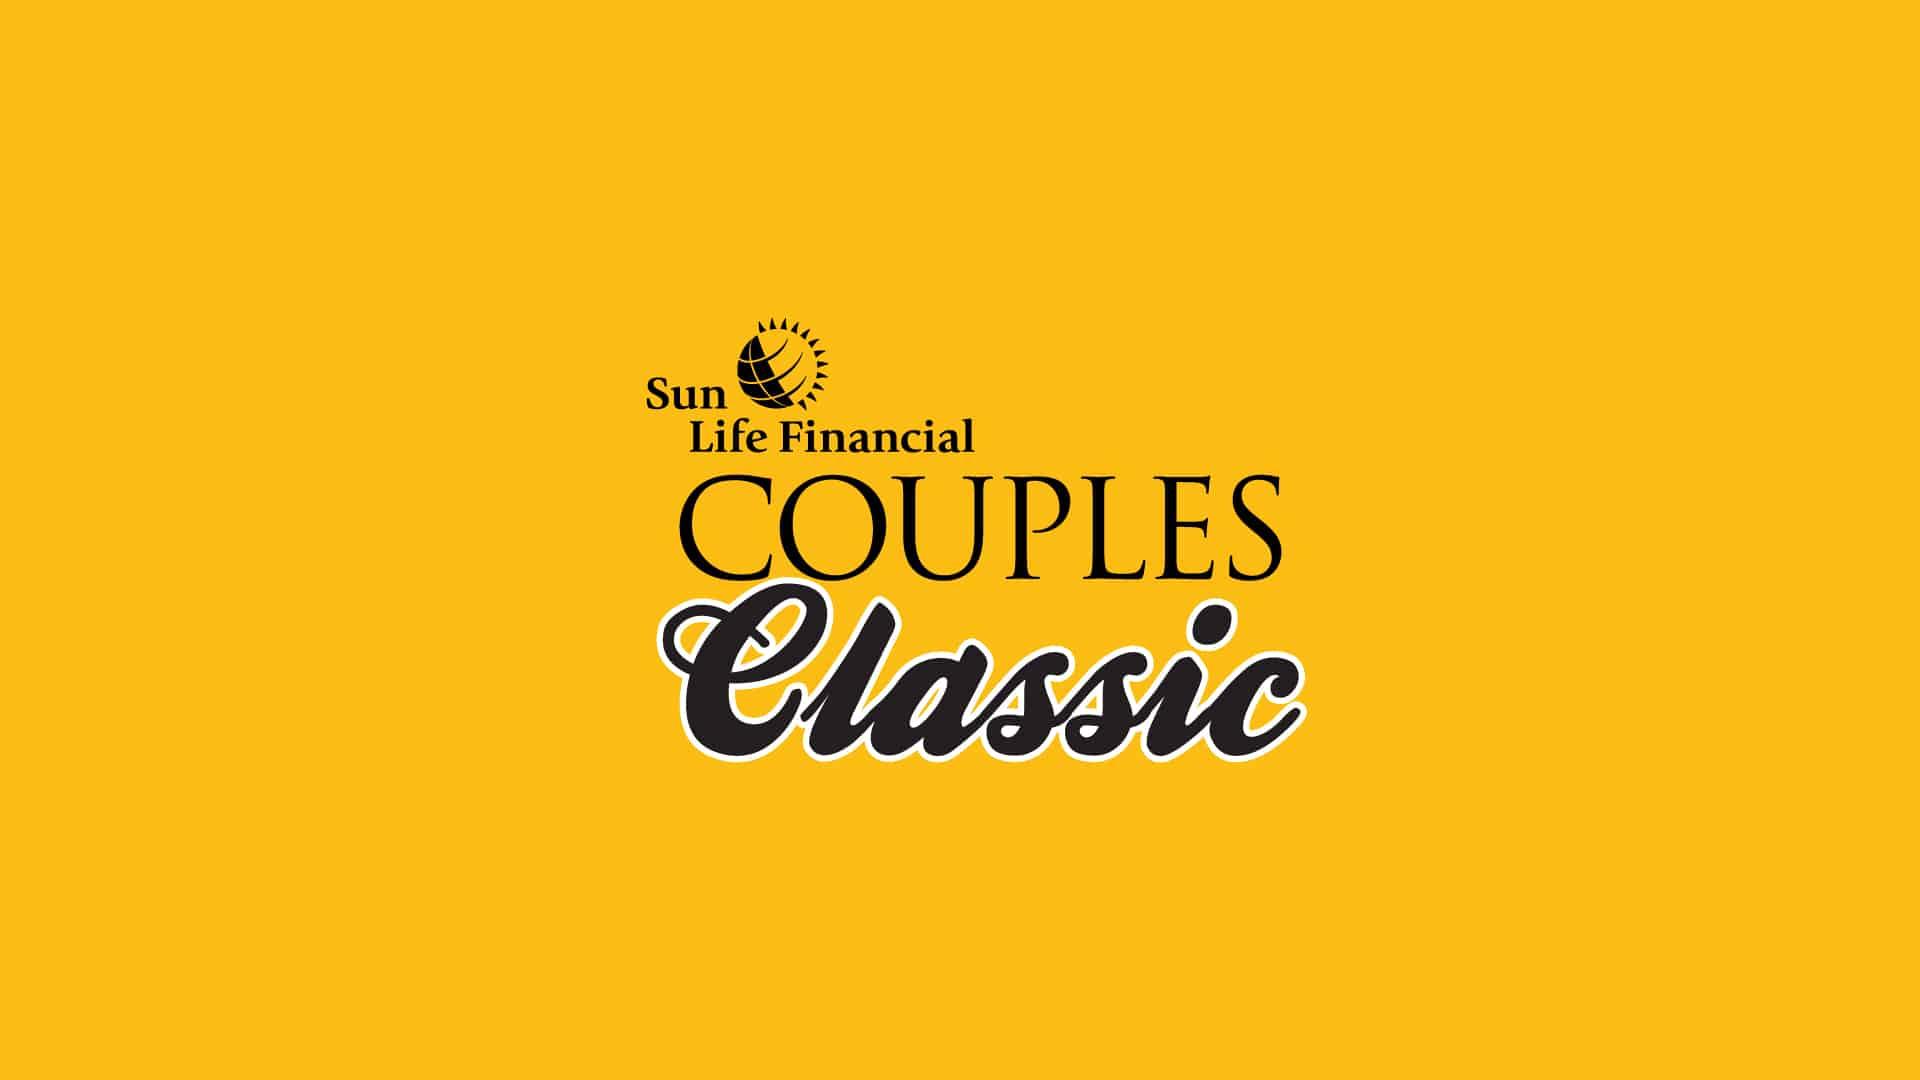 Sun Life Financial Couples Classic